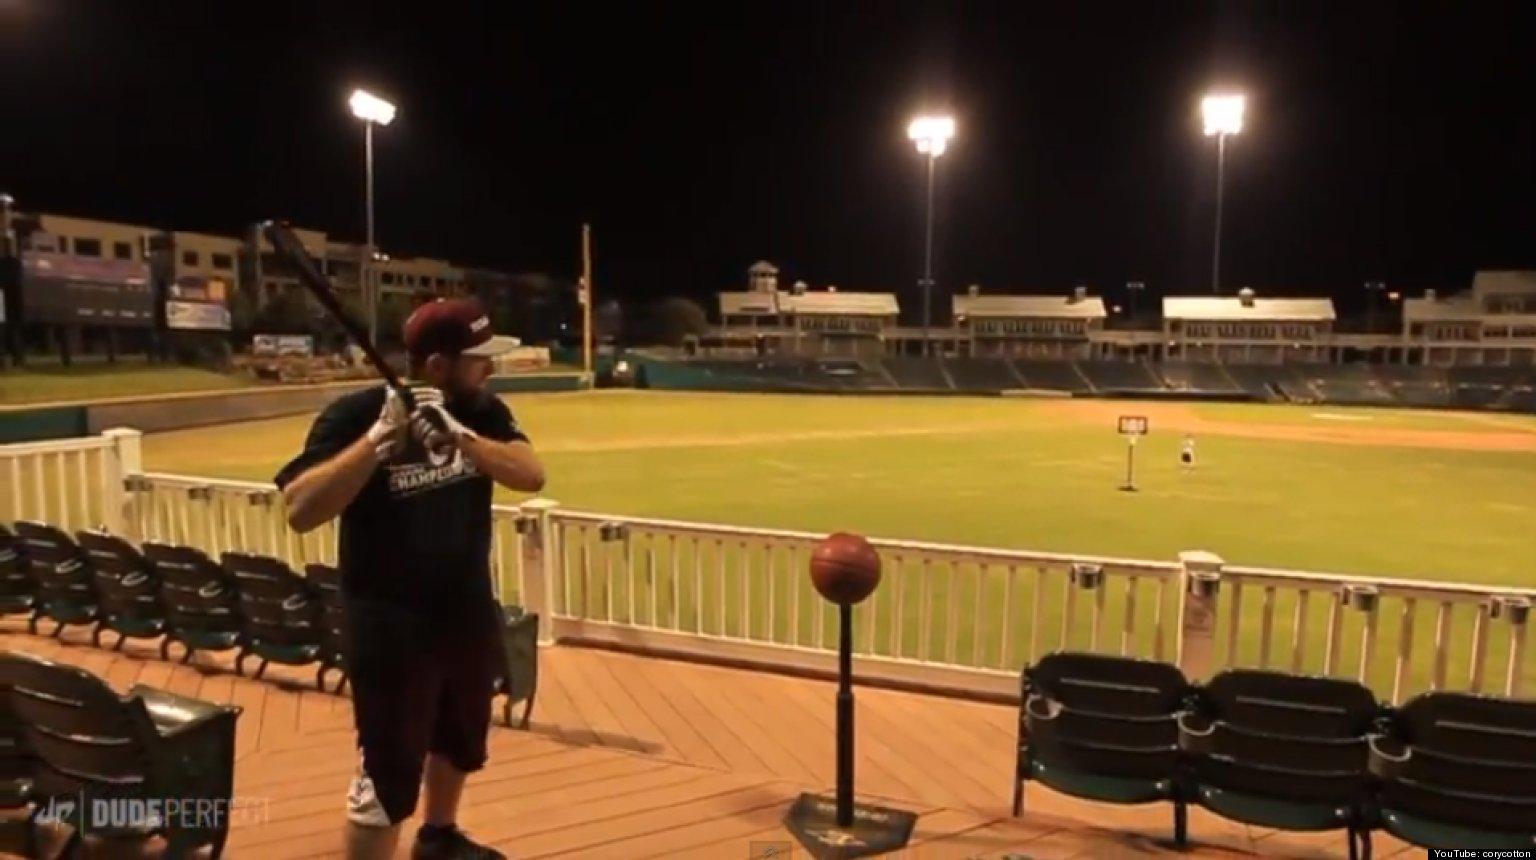 'Dude Perfect' Sinks Basketball Trick Shot Using A Baseball Bat Dubbed 'The Boom Stick' (VIDEO ...